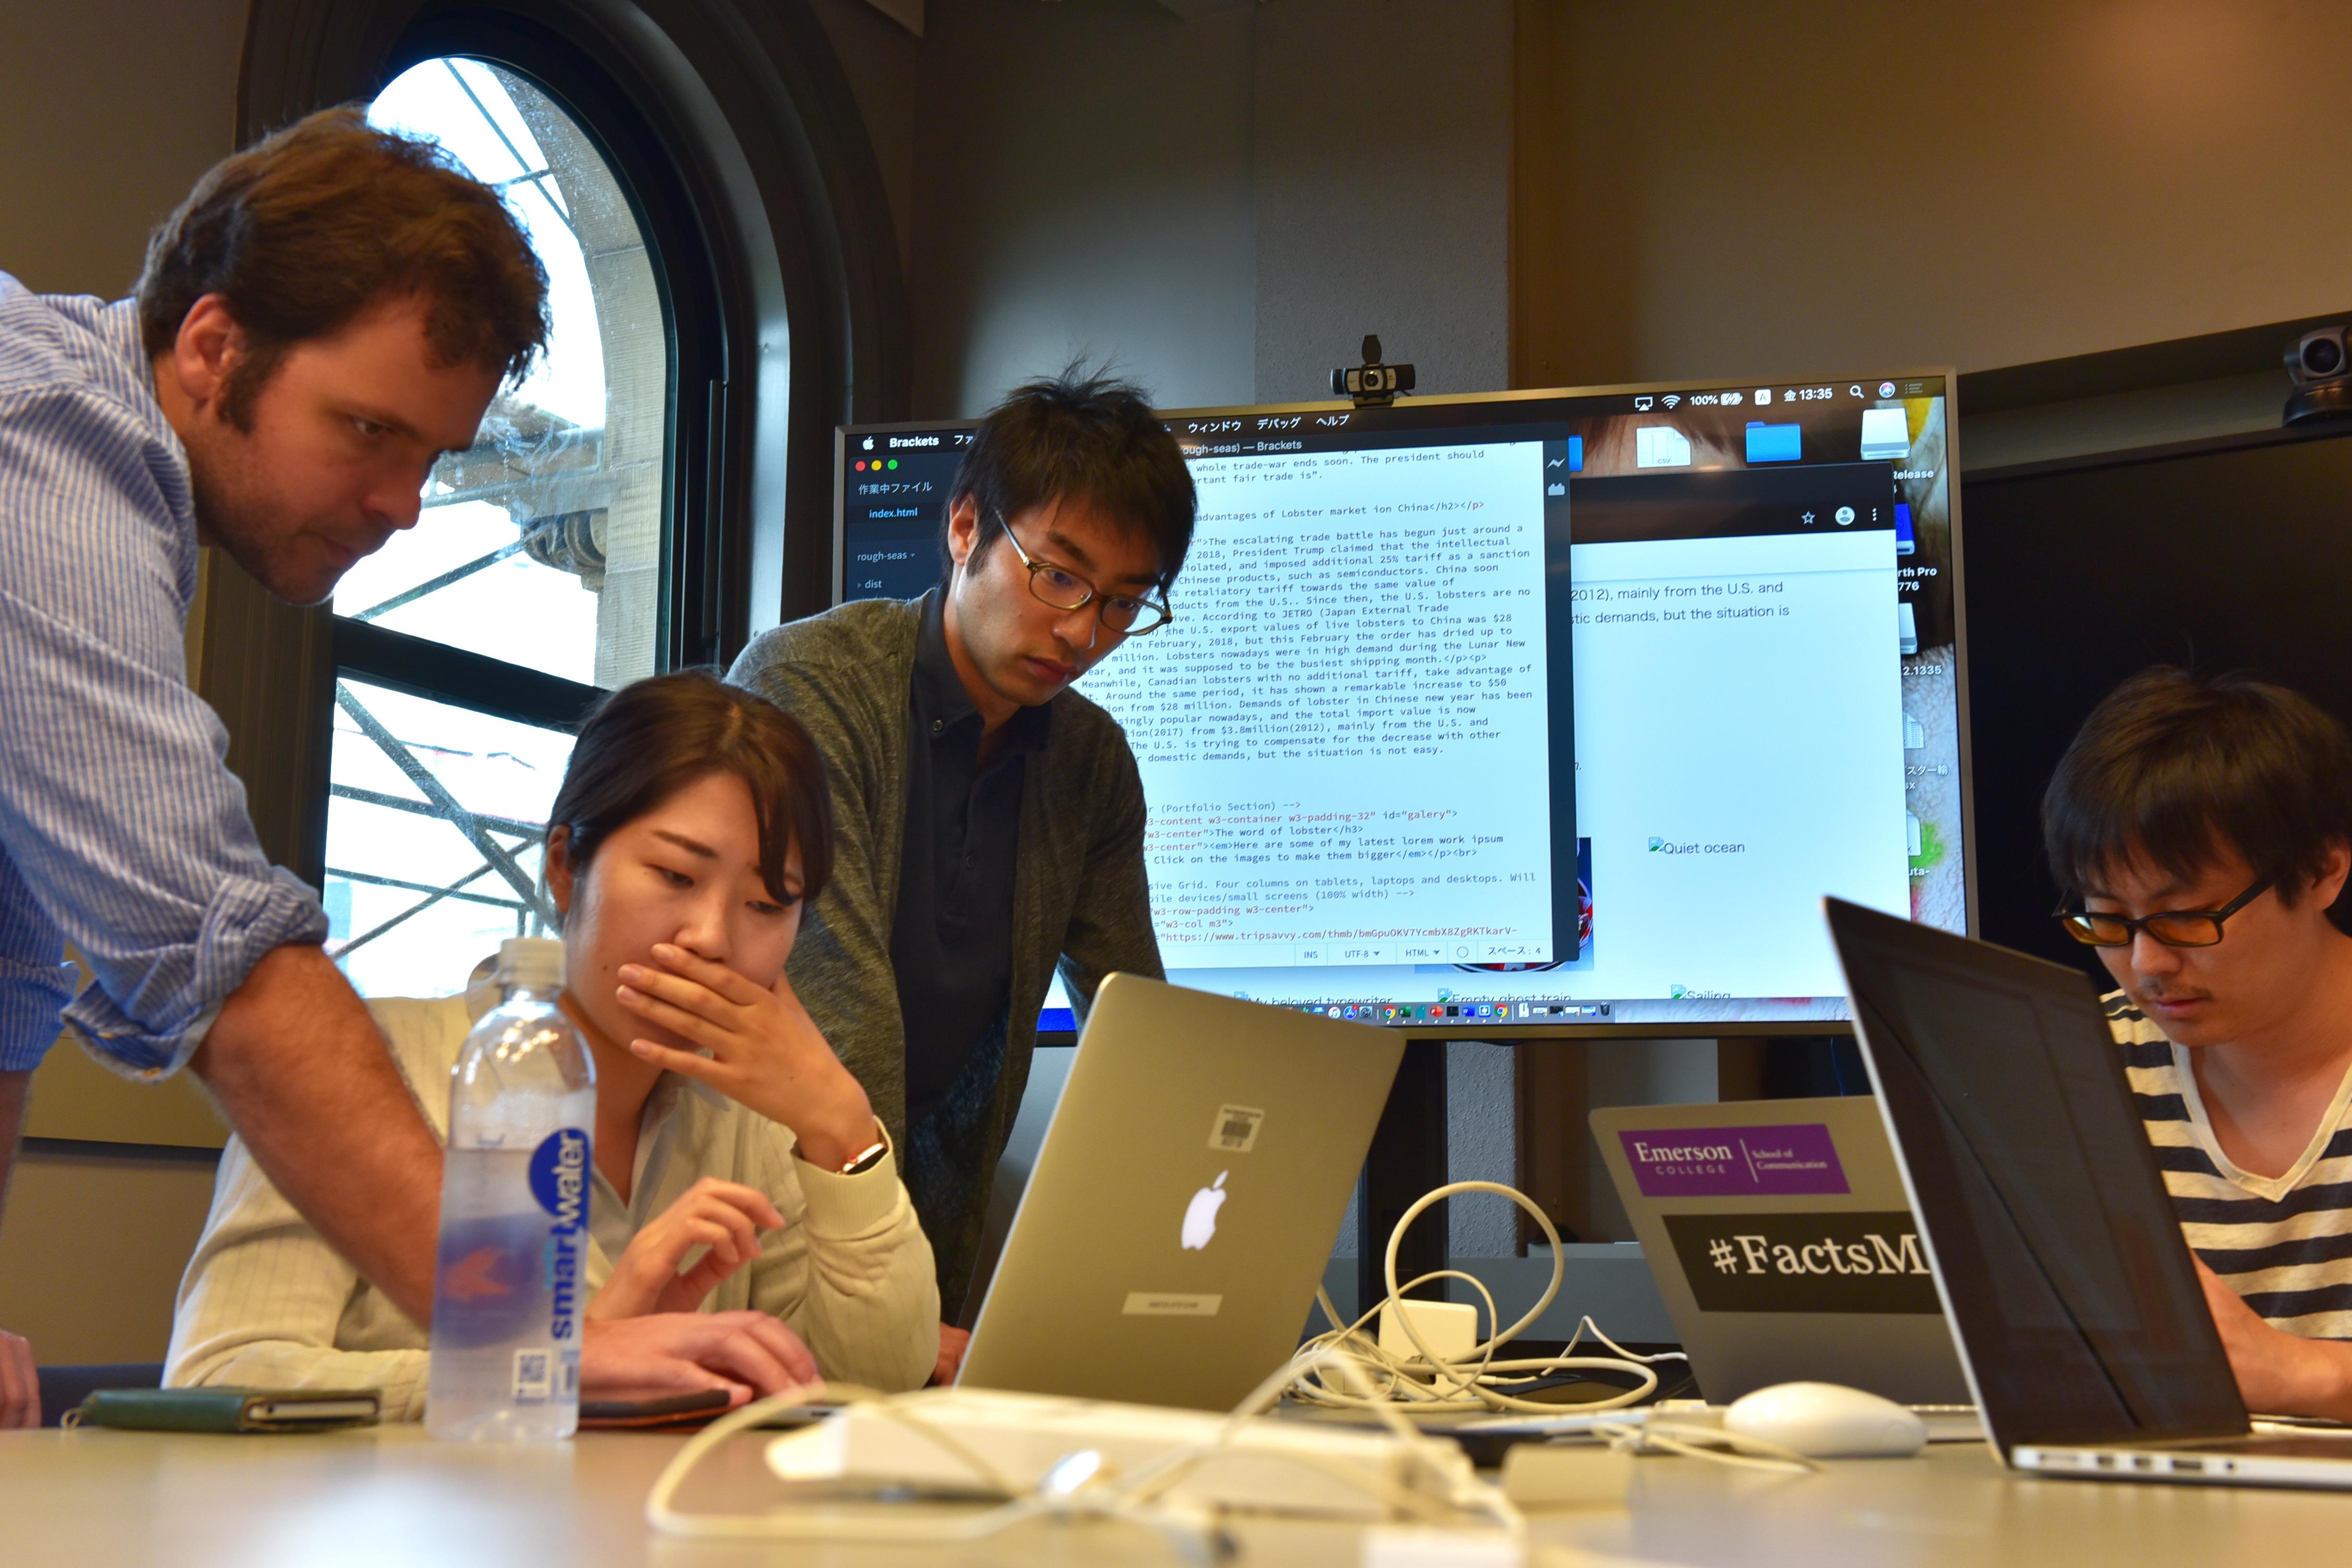 Professor looks at laptop screen of Yomiuri Shimbun journalists